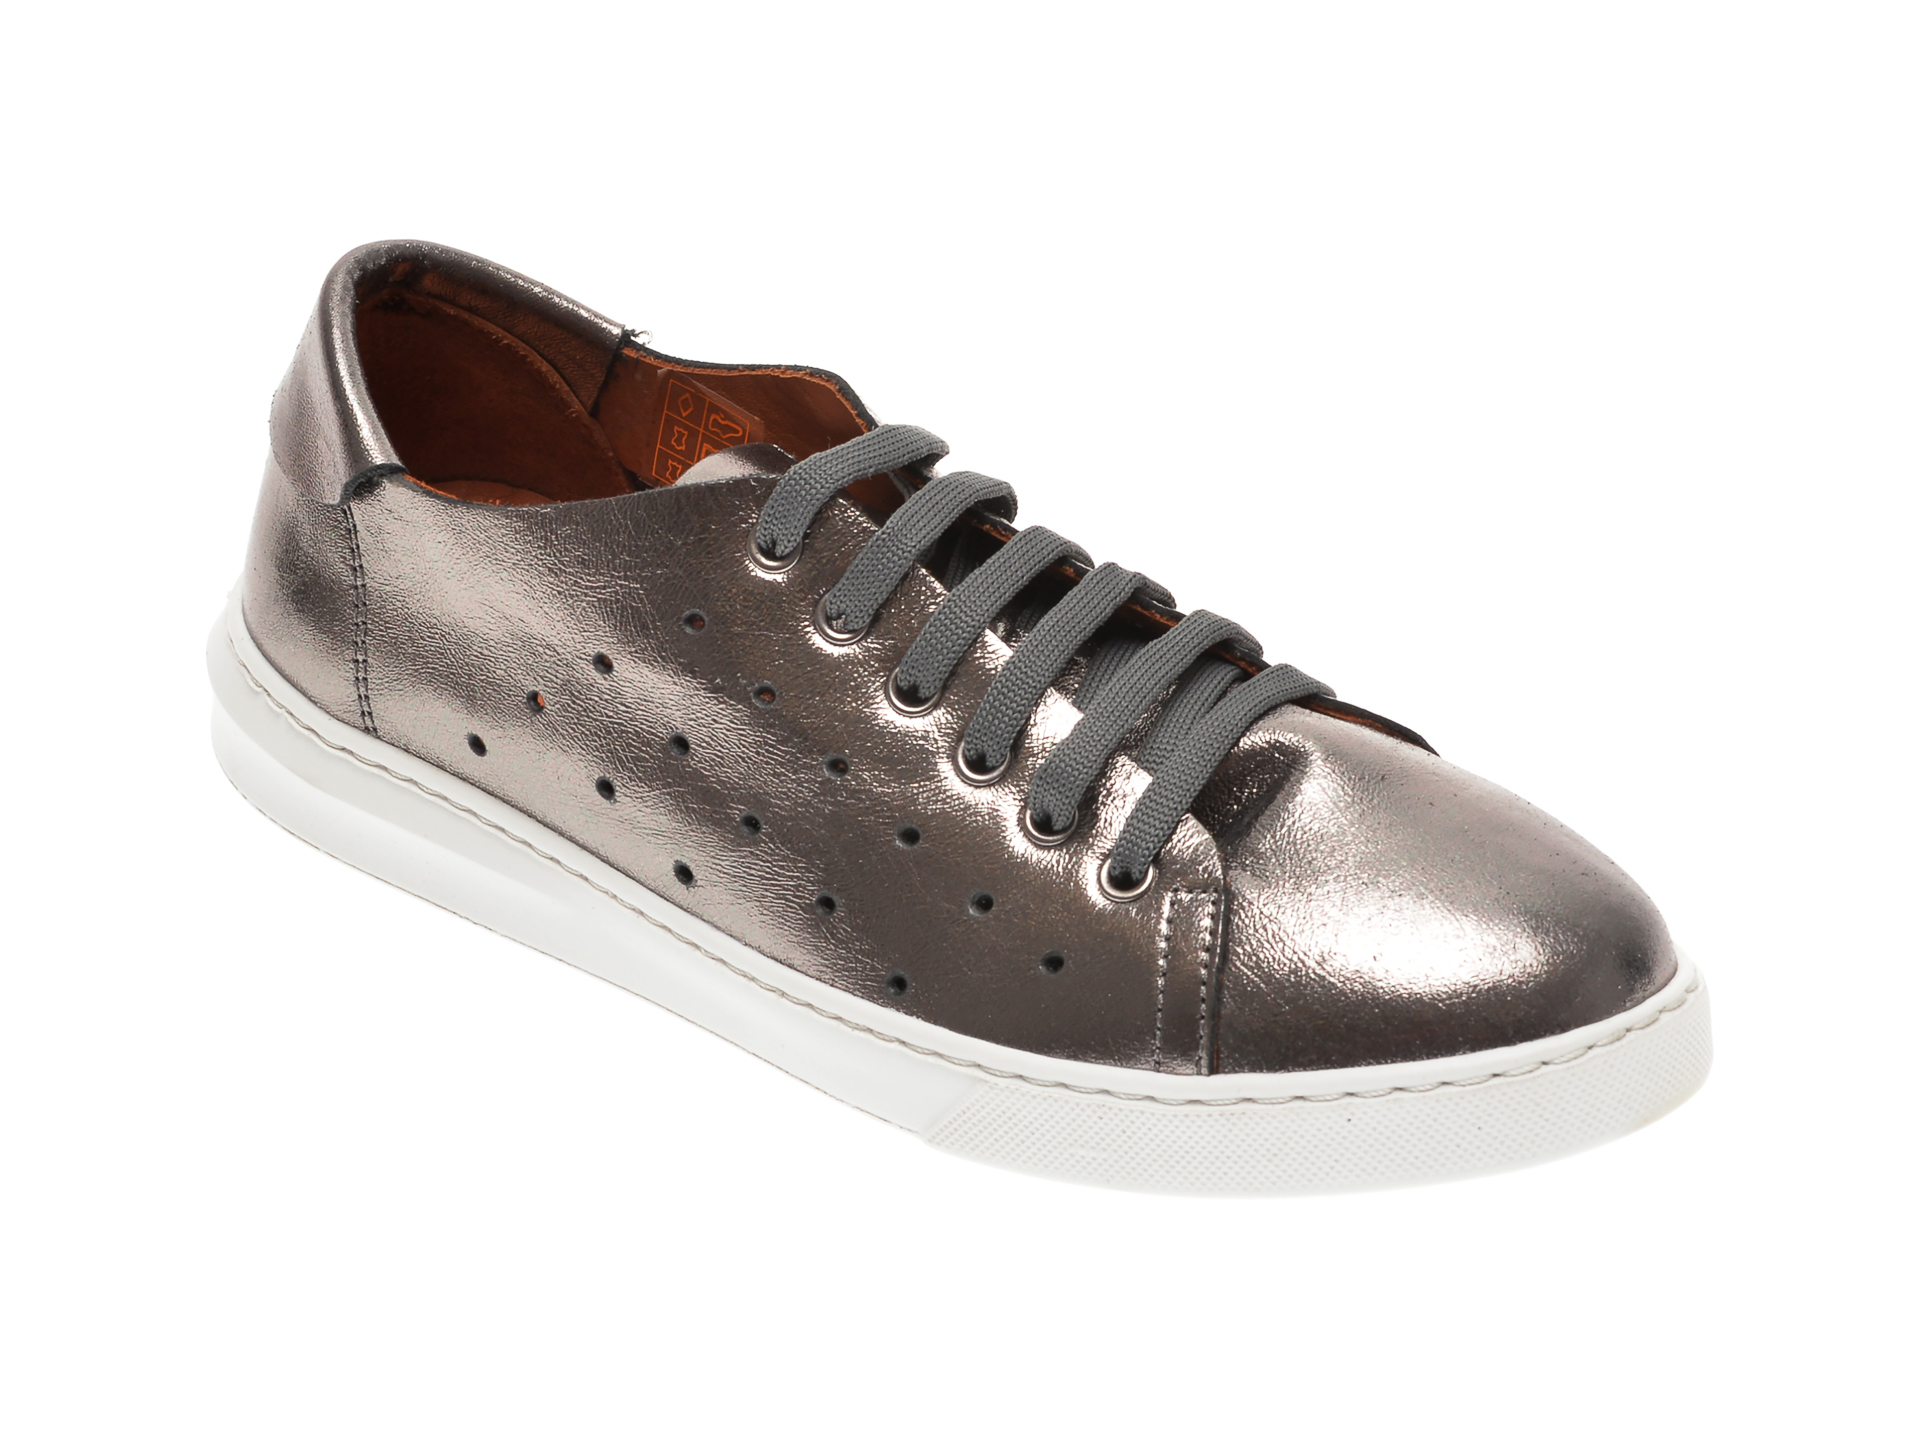 Pantofi BABOOS argintii, 2301, din piele naturala imagine